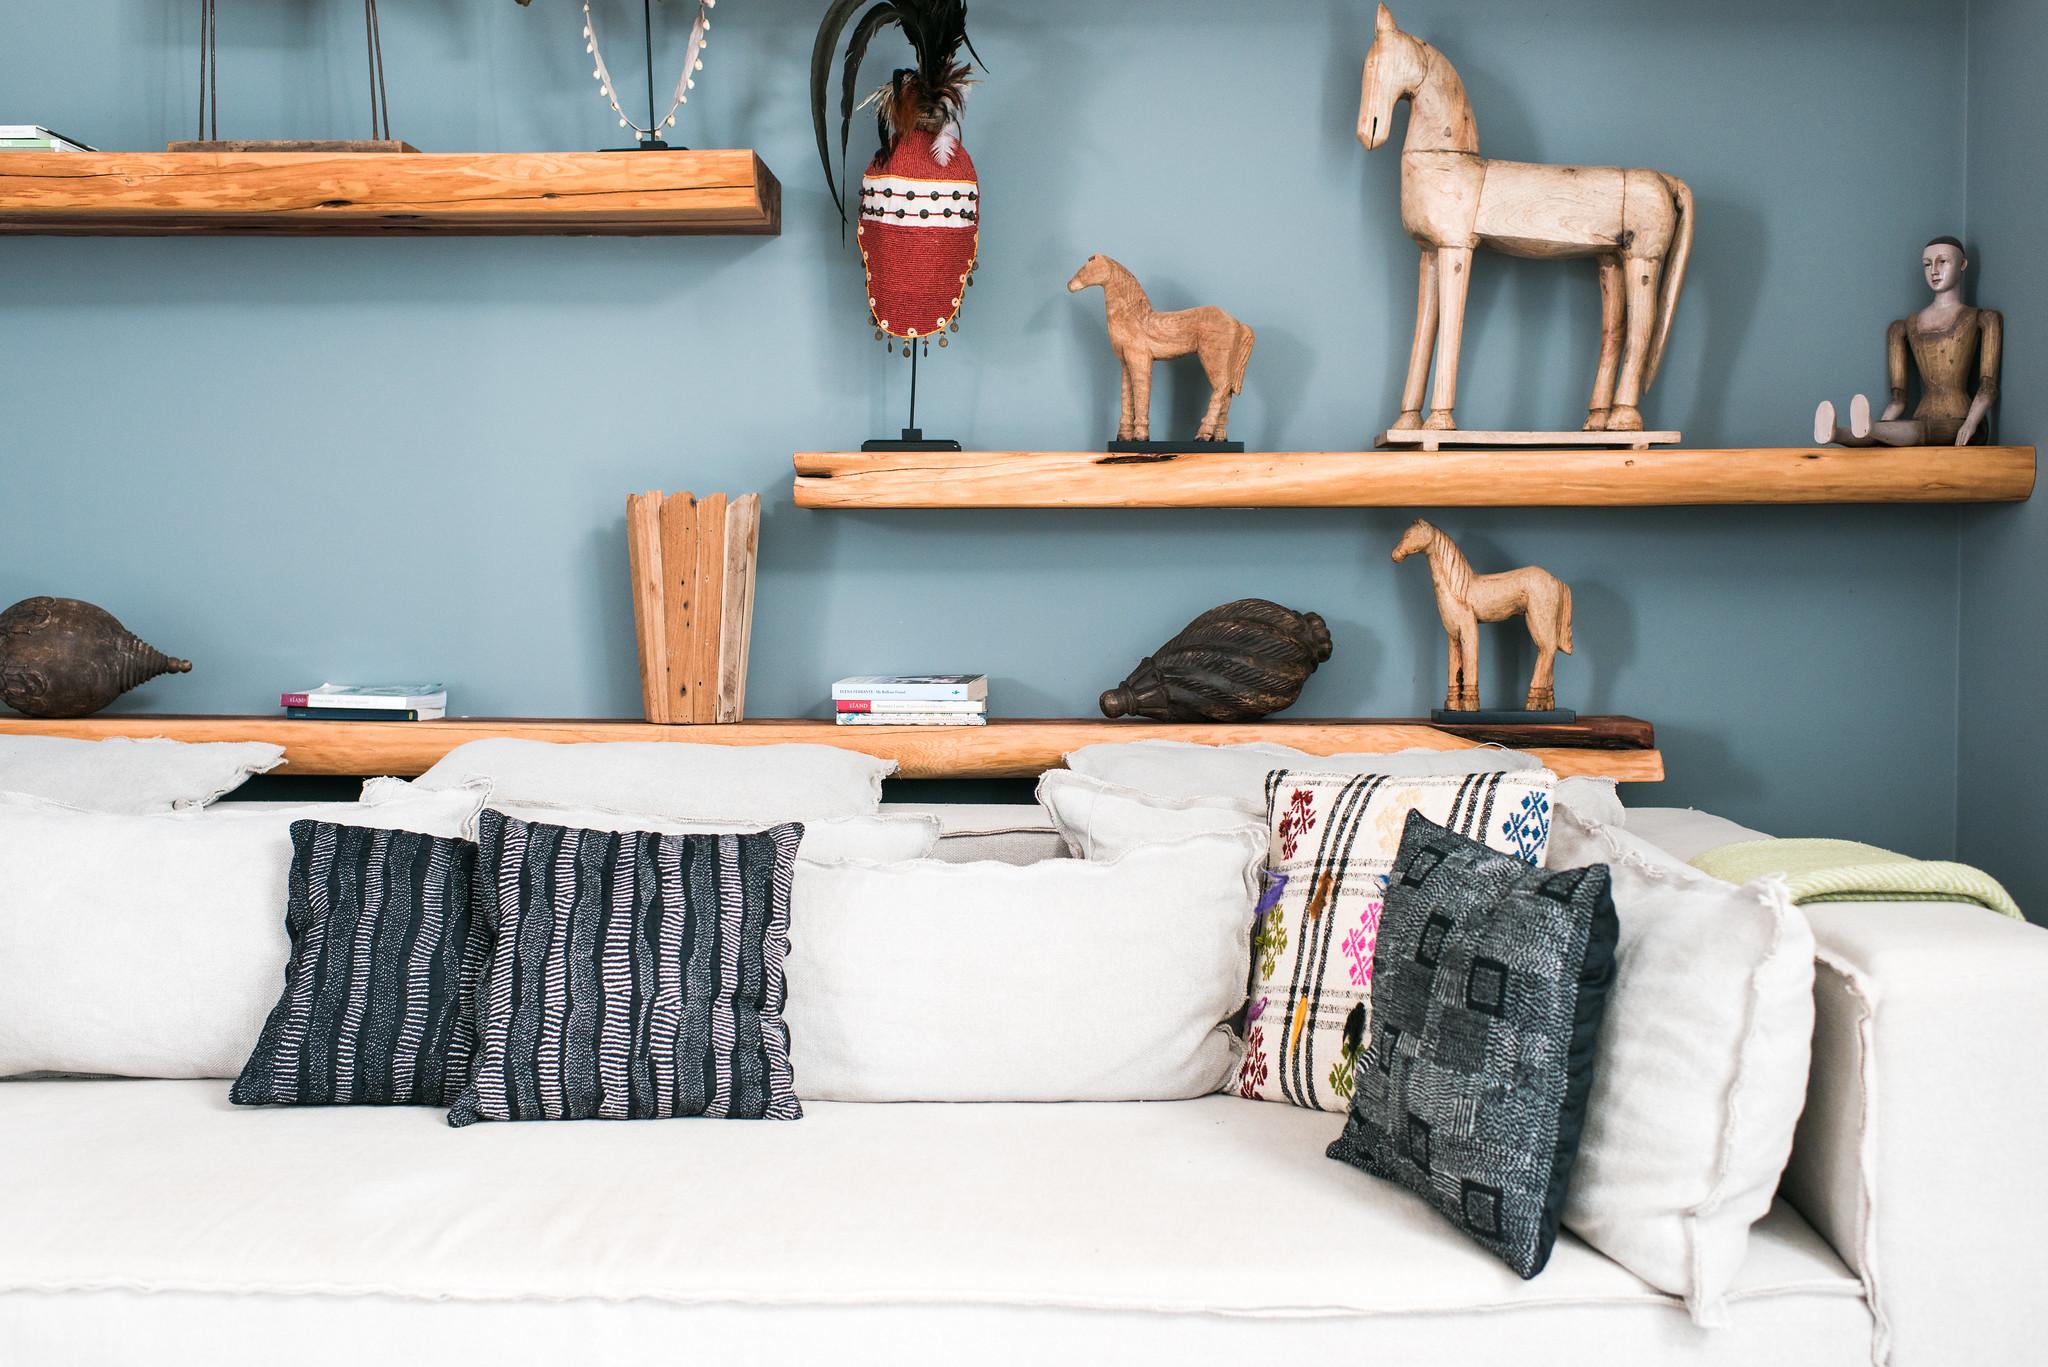 https://www.white-ibiza.com/wp-content/uploads/2020/05/white-ibiza-villas-can-zama-cinema-room-sofa.jpg